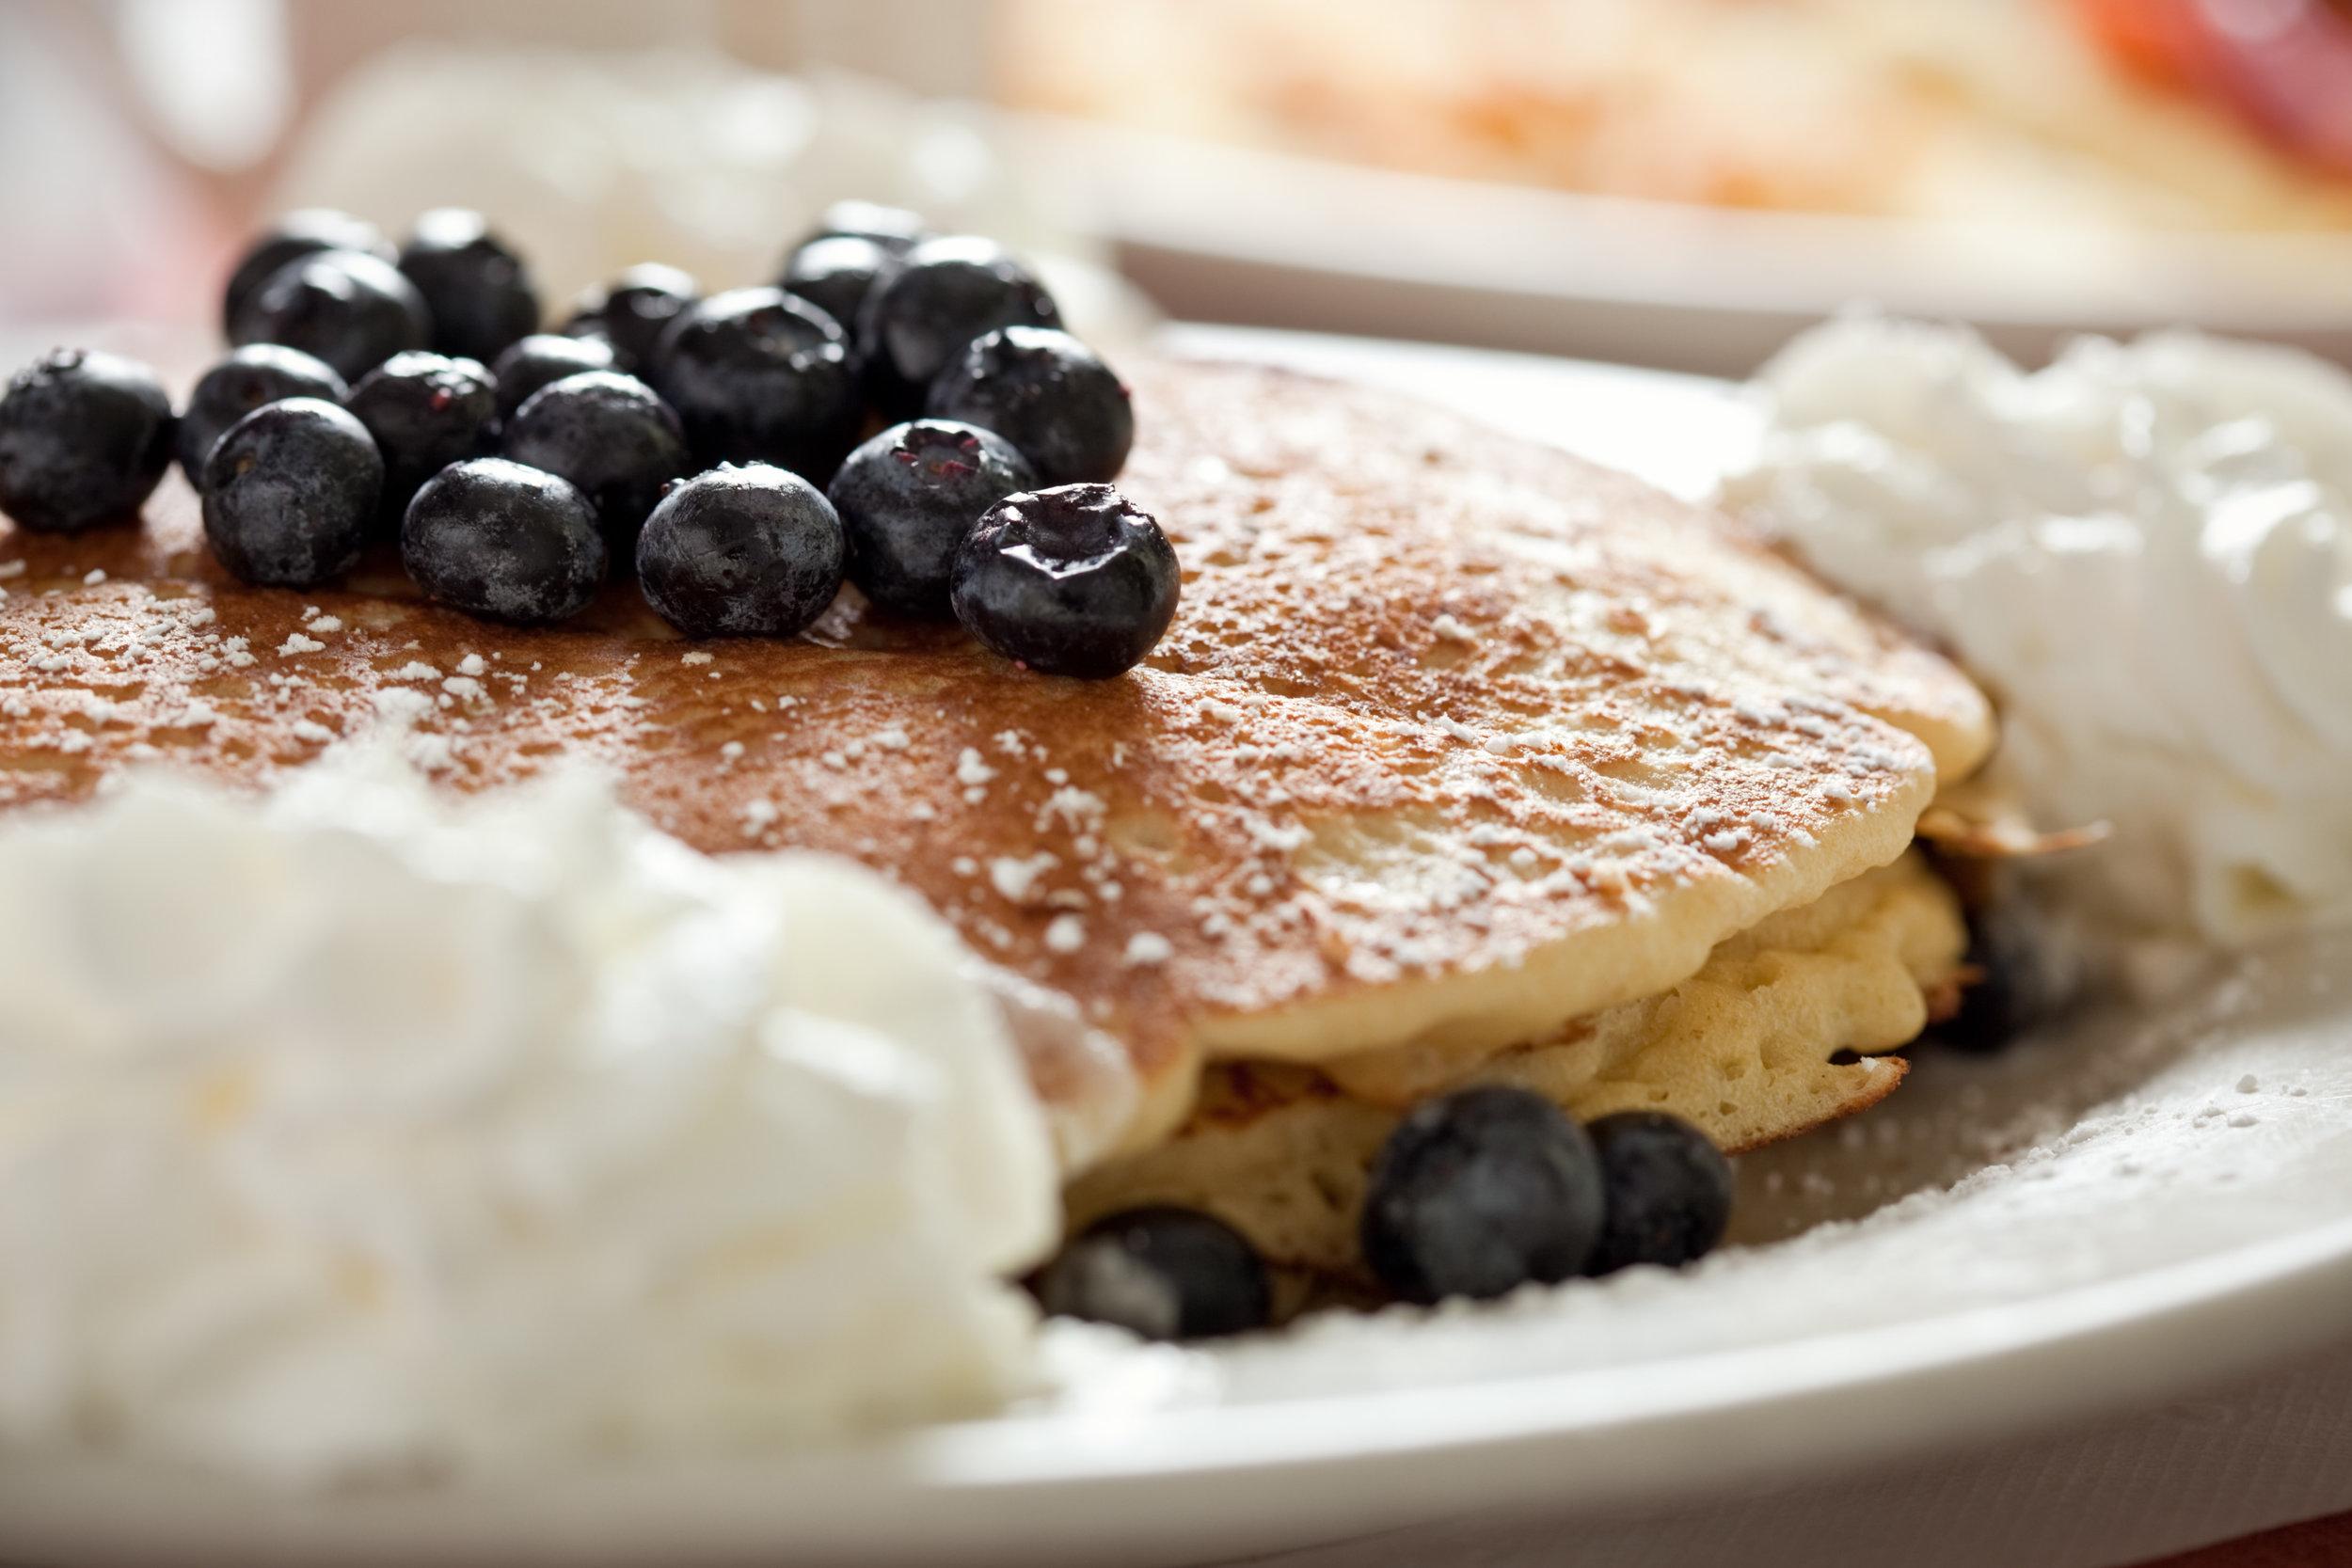 Eagleview-Town-Center_Retail-1_Nudys-Cafe_Stock-Photos_blueberry-pancakes-1.JPG